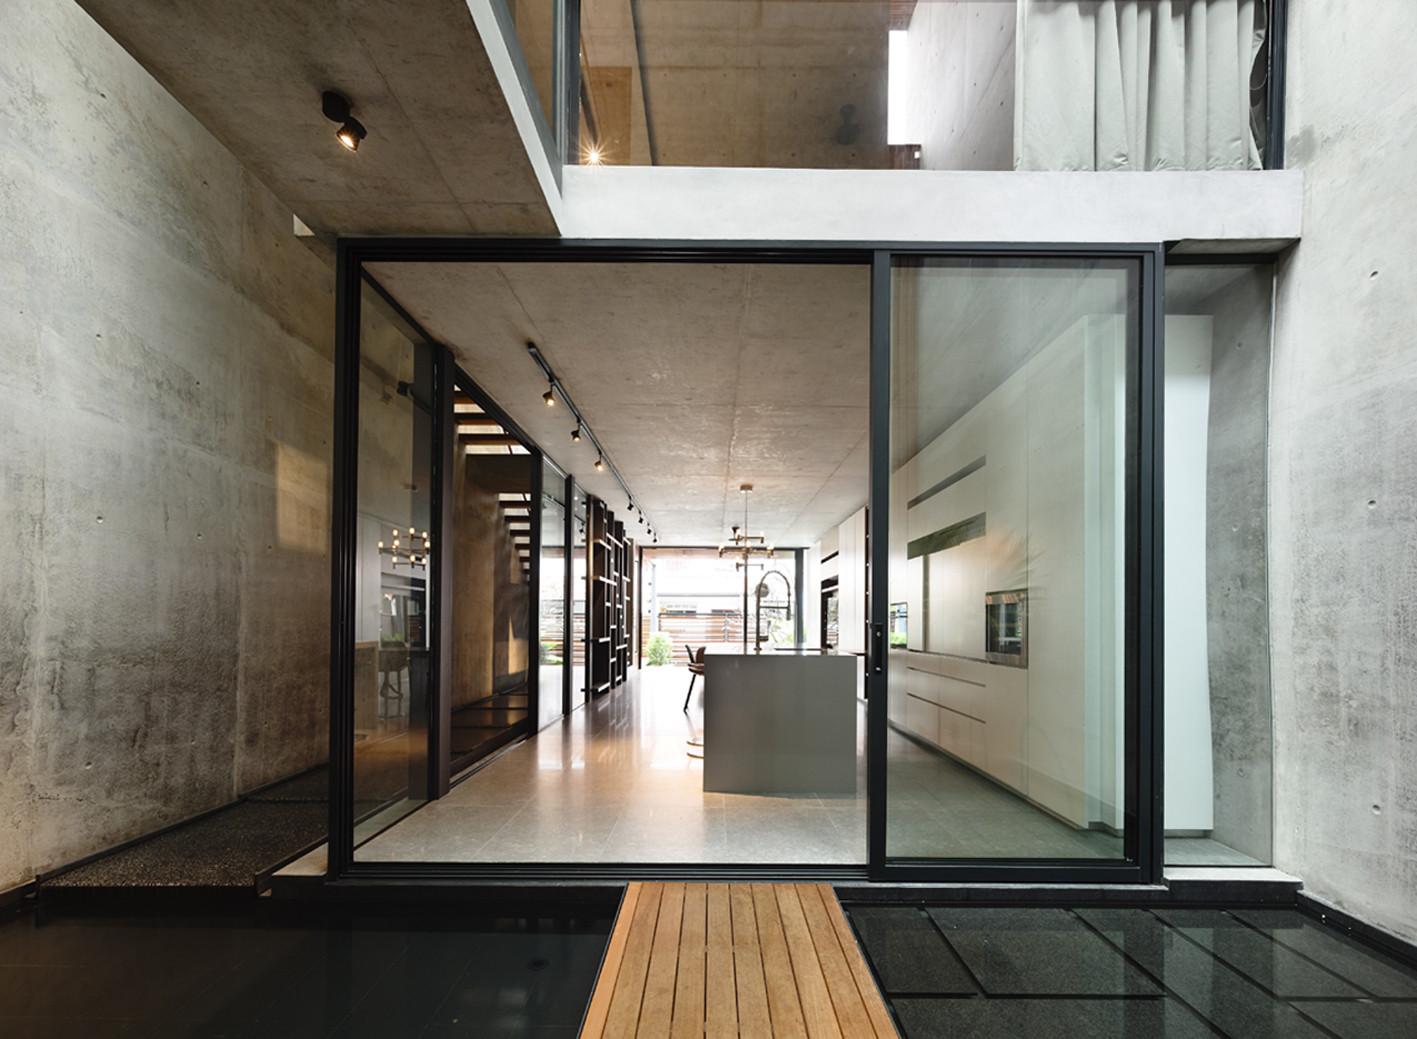 Belimbing Avenu / hyla architects, © Derek Swalwell